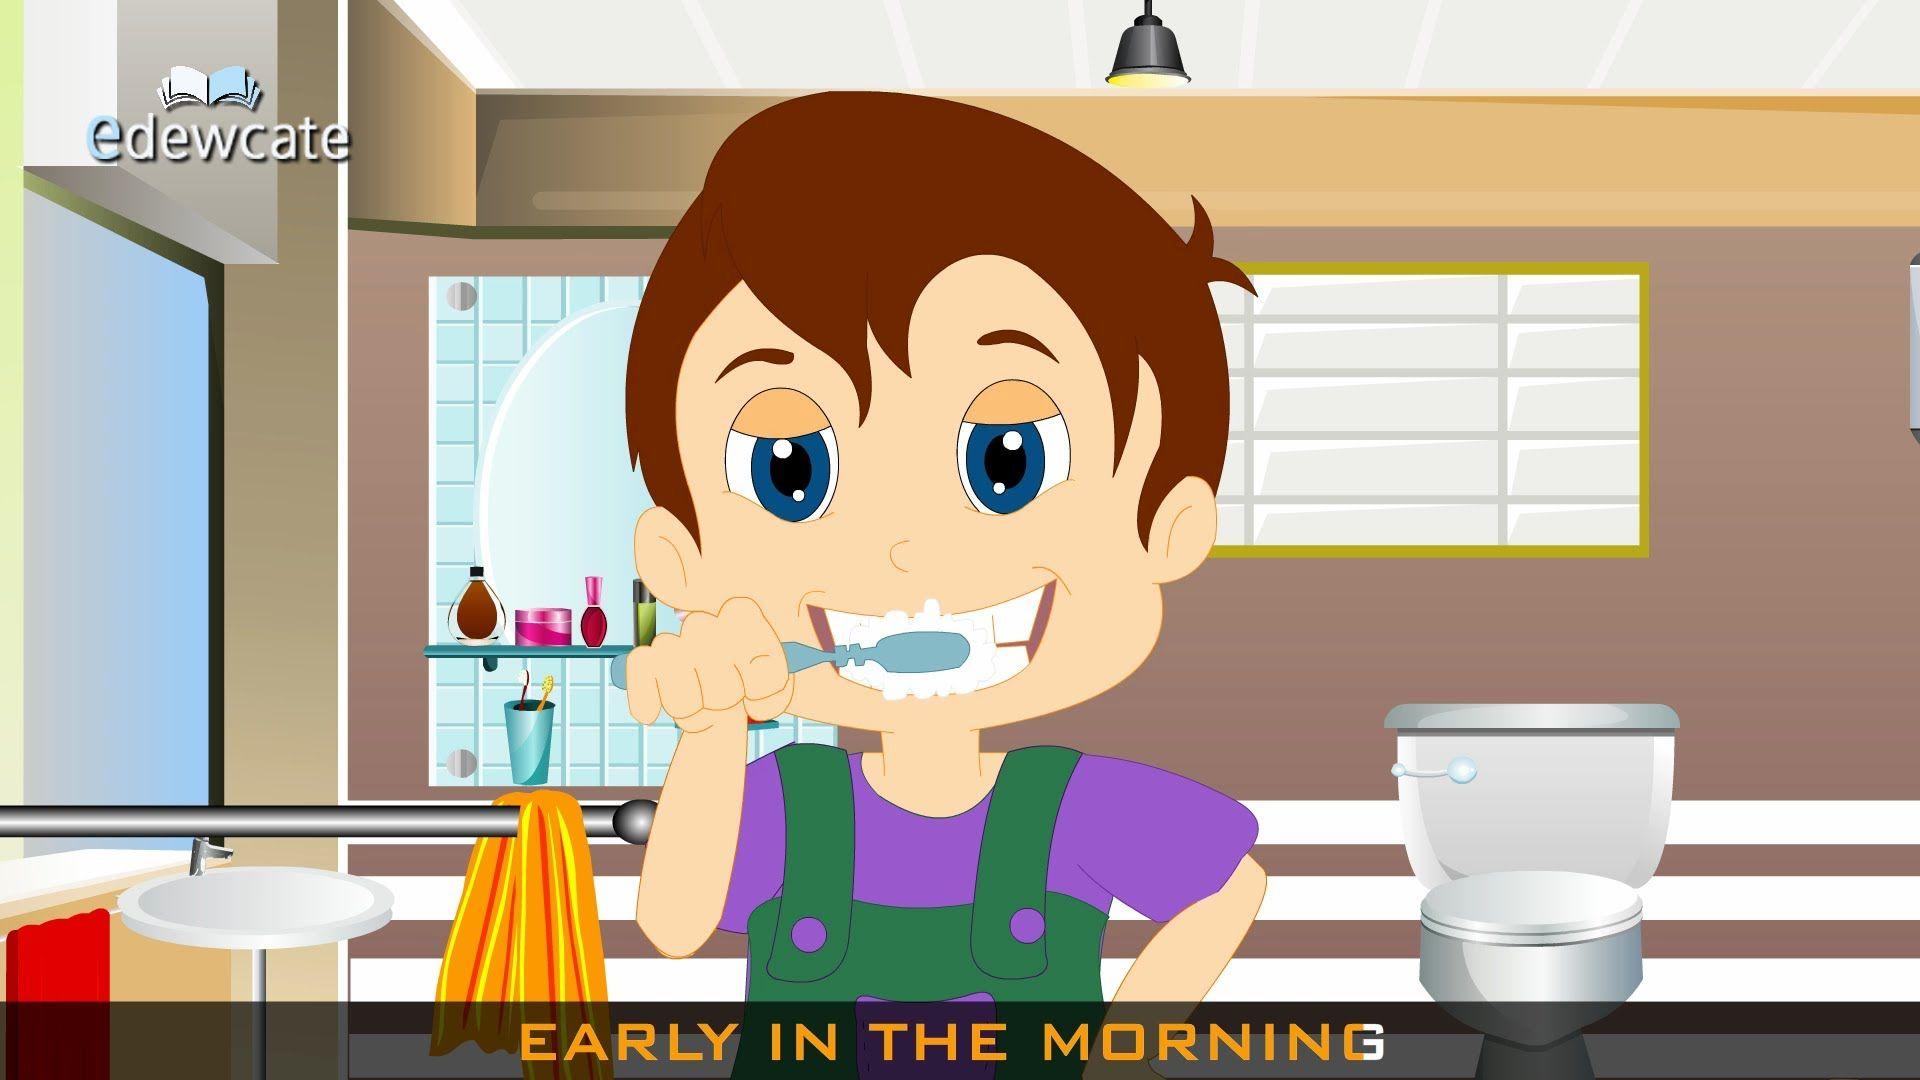 4f0b1bafdc0697f54d0d1c8836343970 - How To Get In The Habit Of Brushing My Teeth